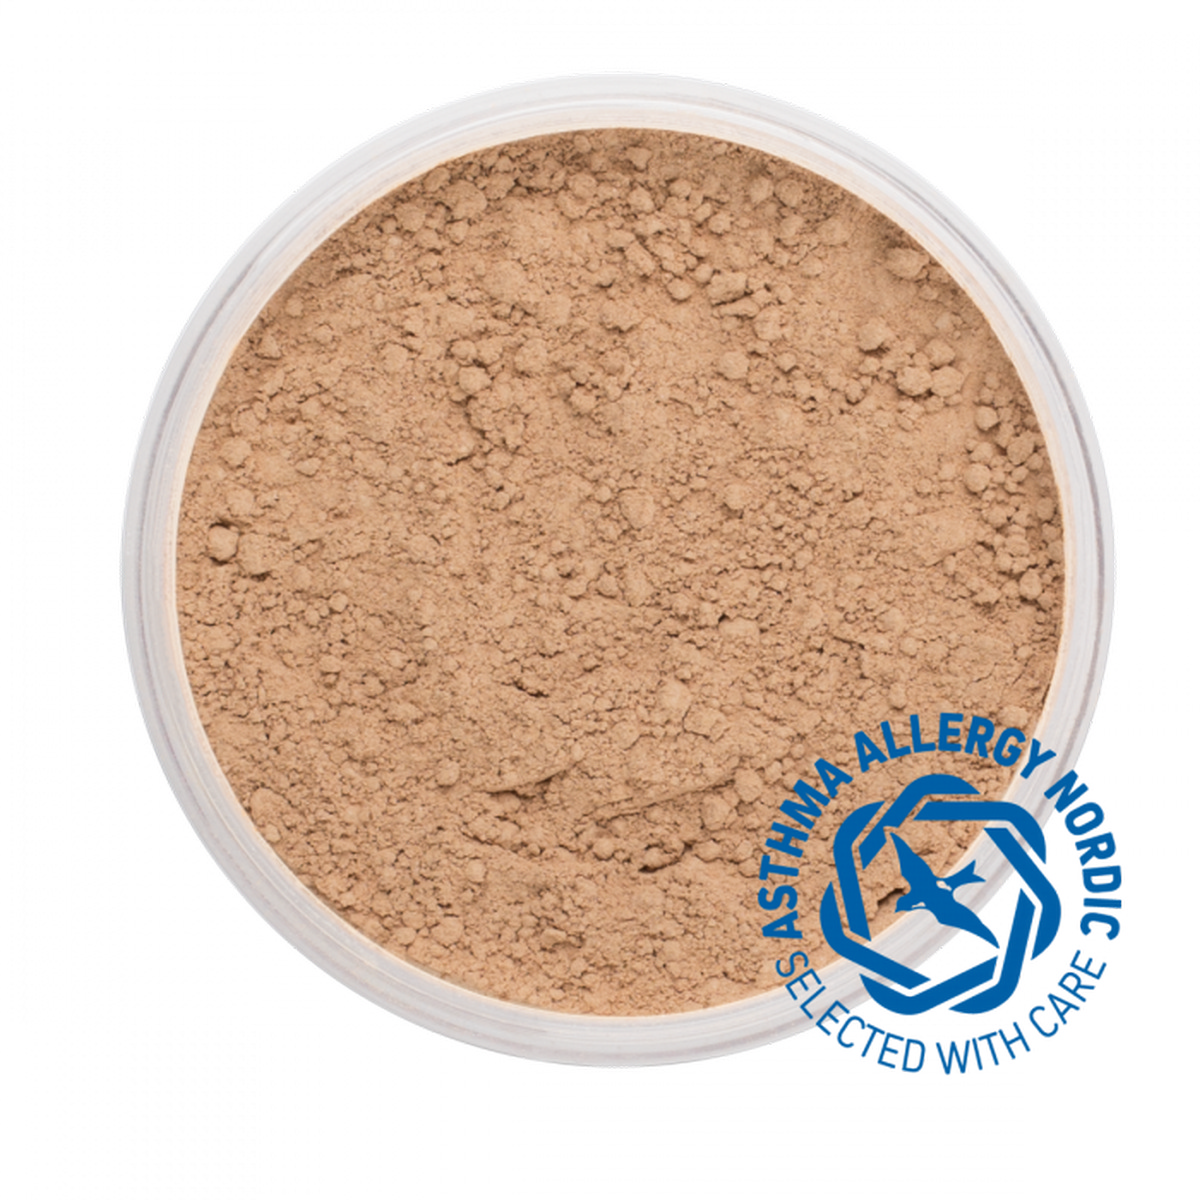 Powder Mineral Foundation 7g